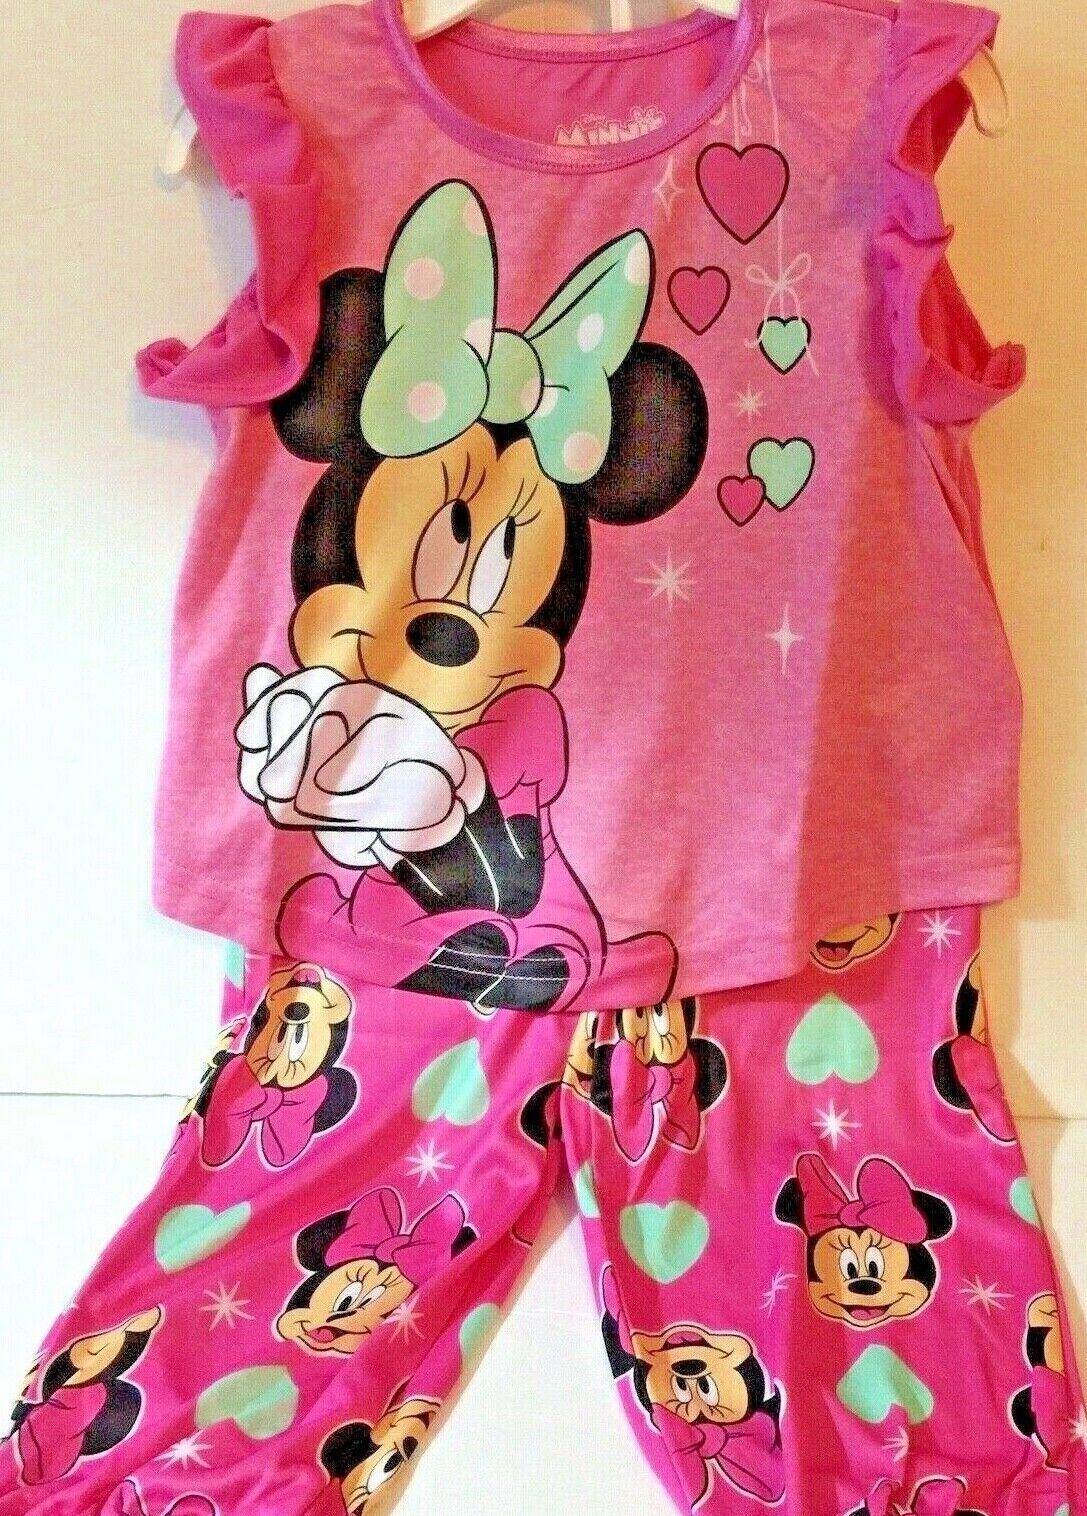 Disney Minnie Mouse Toddler girls pajama set 2T Disney Junior BN10